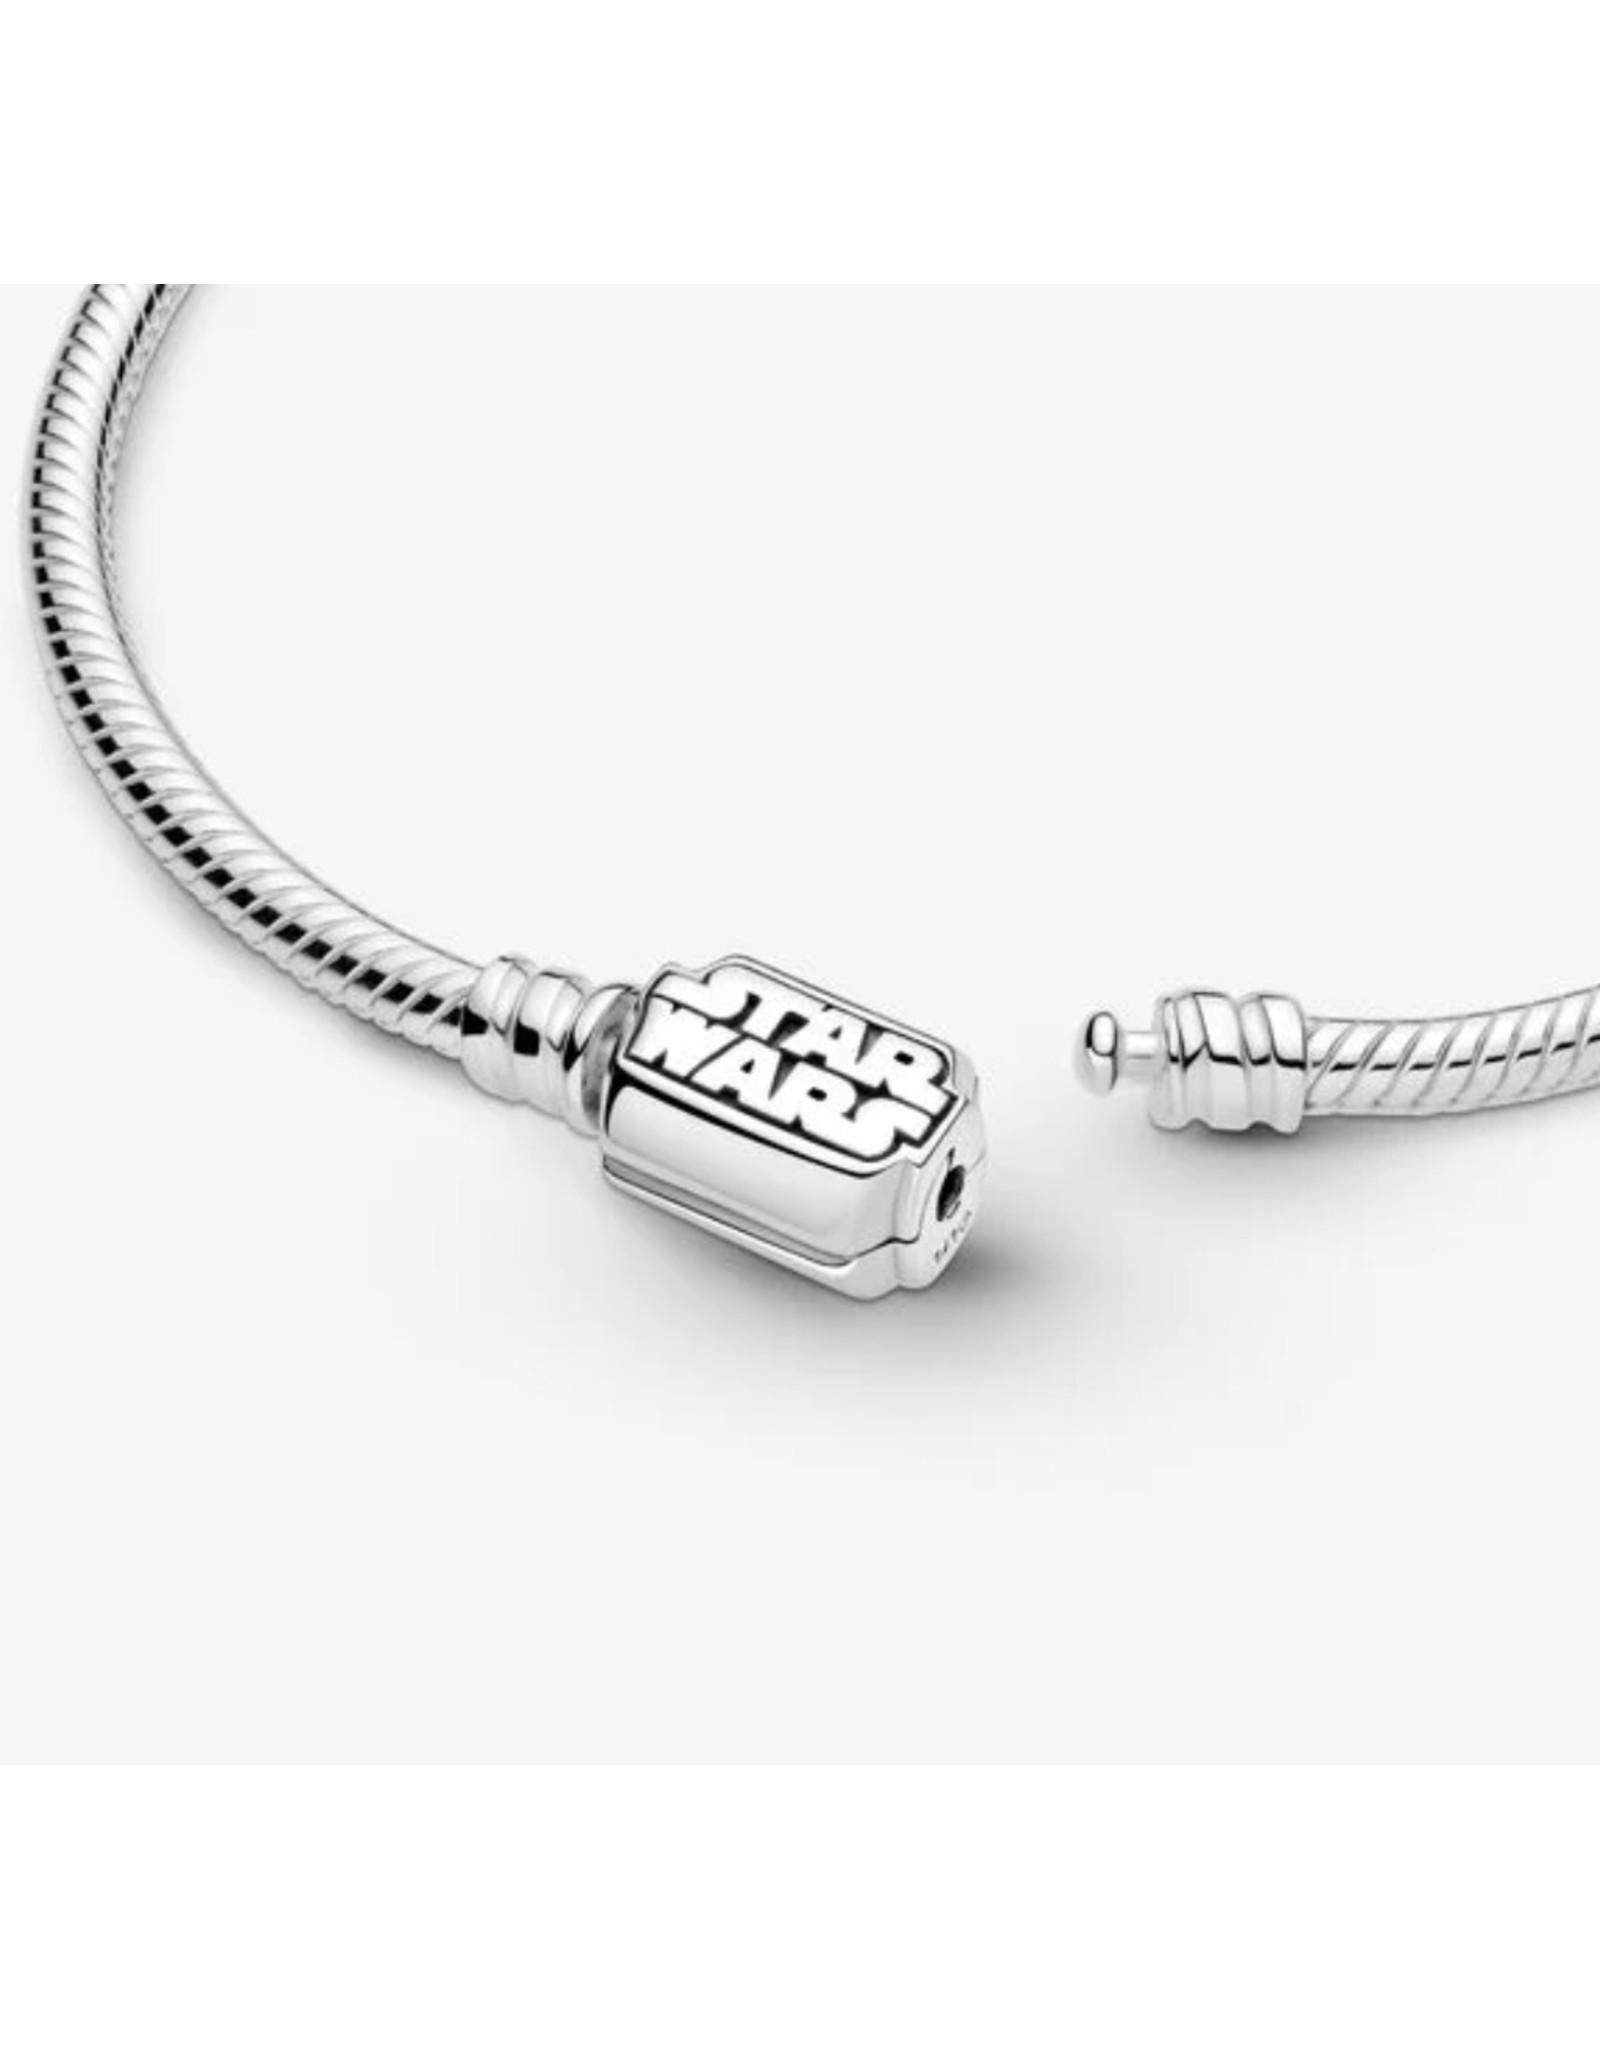 Pandora Pandora Moment Bracelet,599254C00, Star Wars Snake Chain Clasp